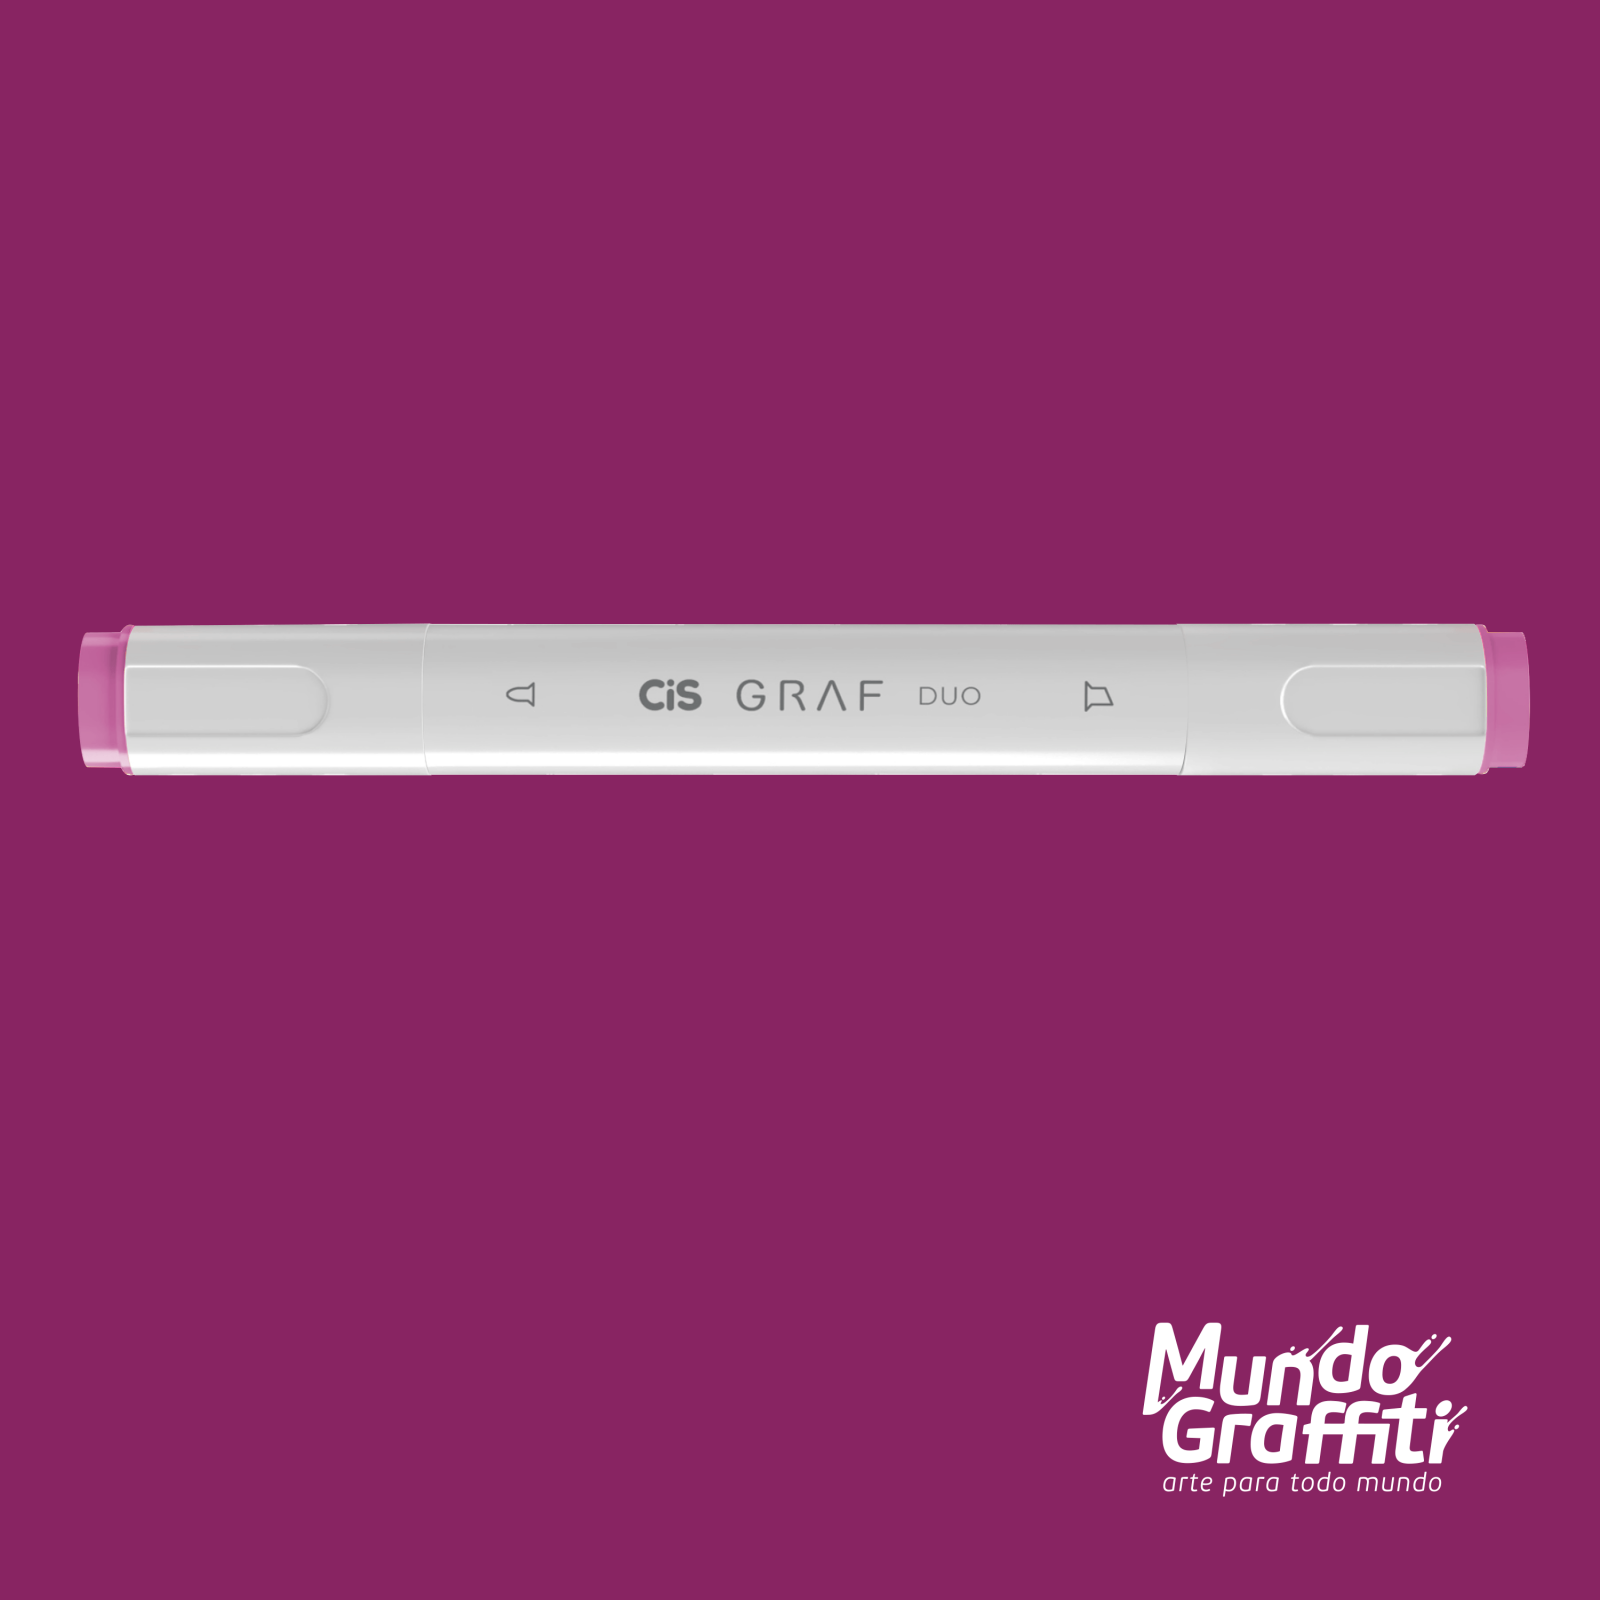 Marcador Cis Graf Duo Vivid Purple 85 - Mundo Graffiti